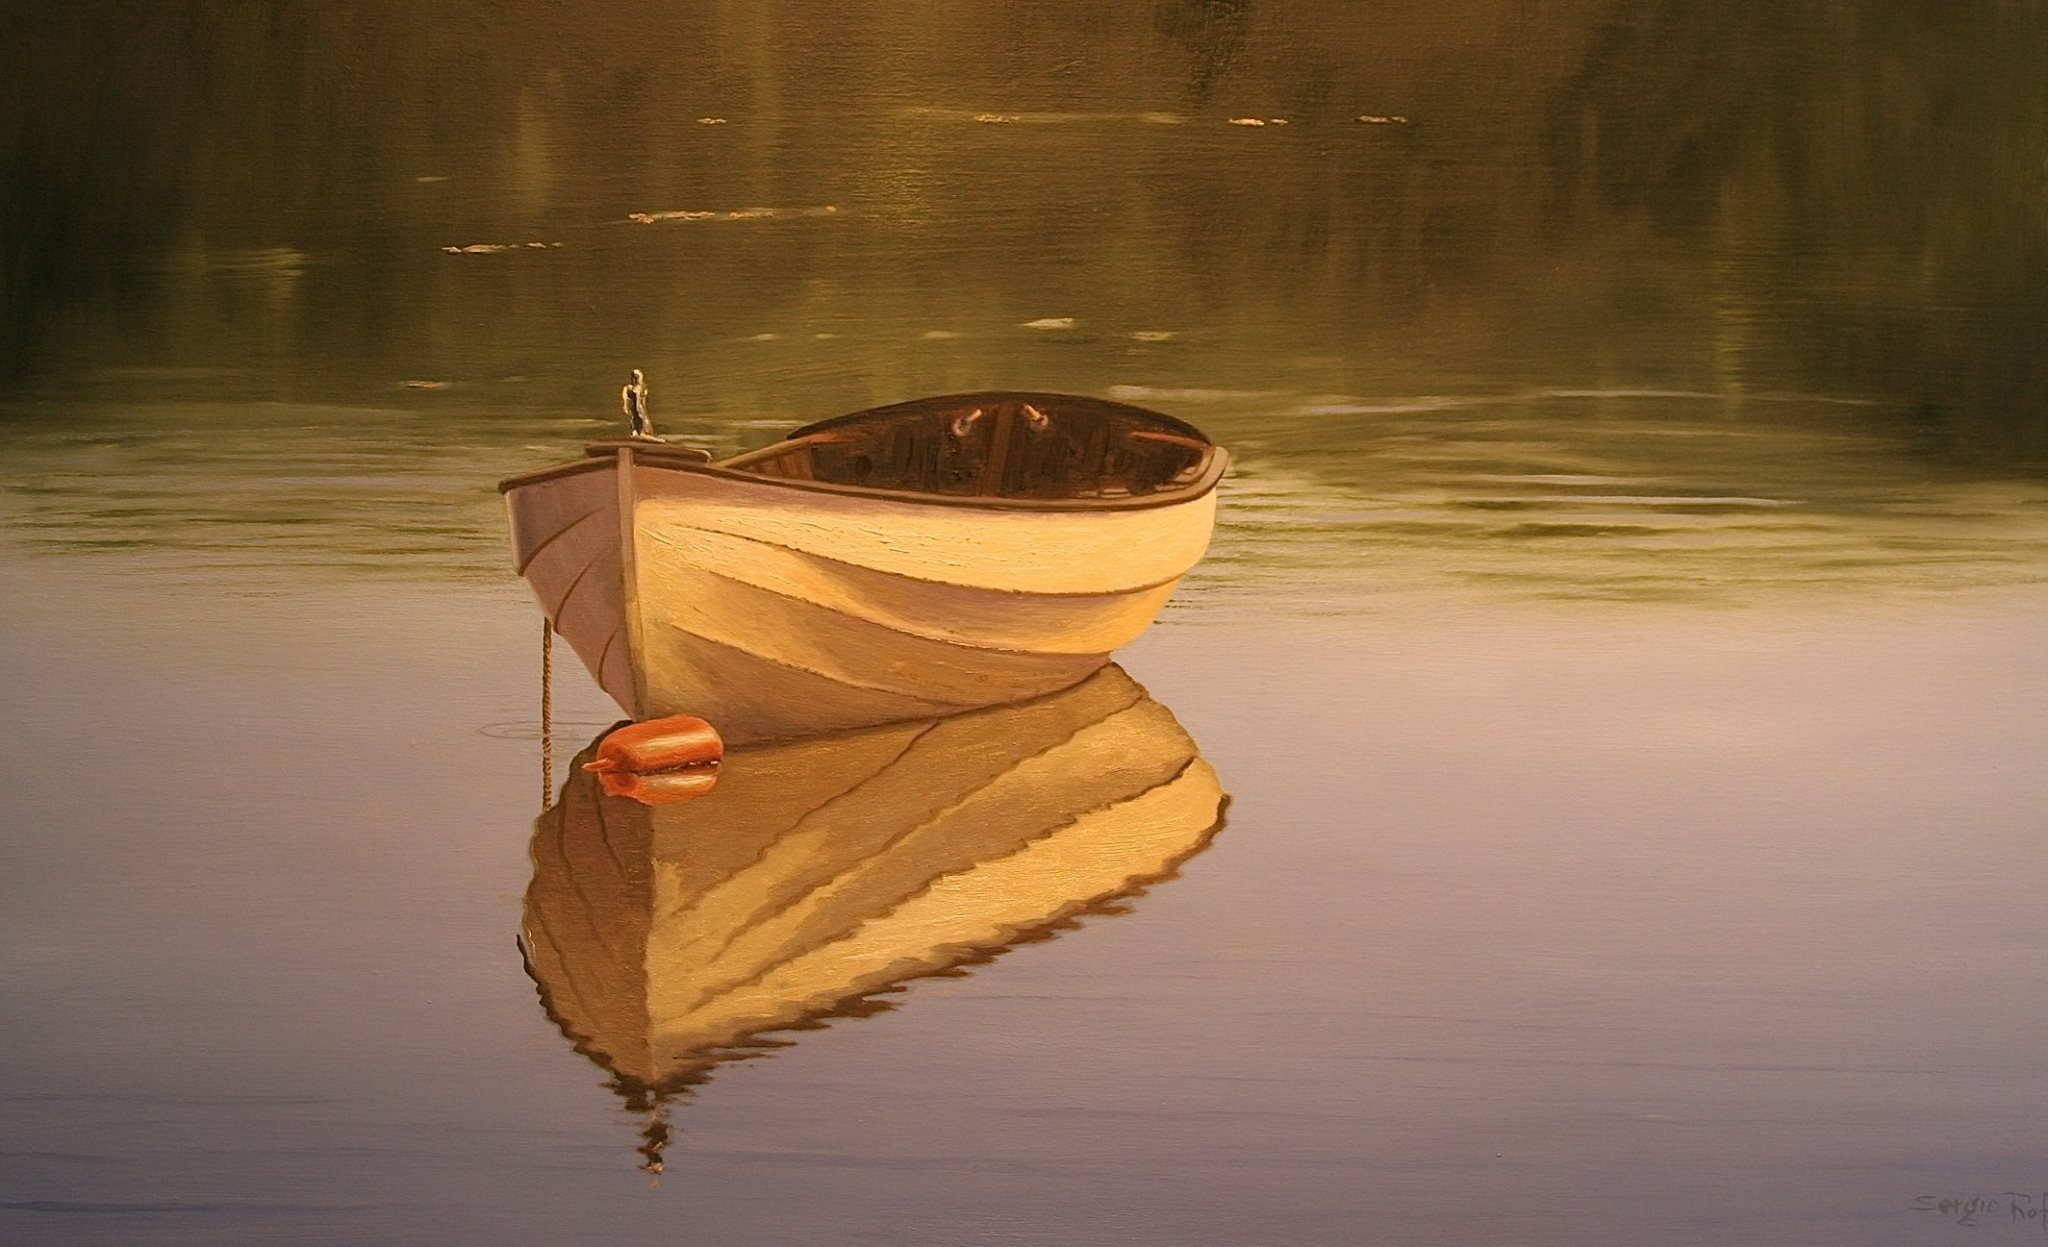 Calmness in Sunlight